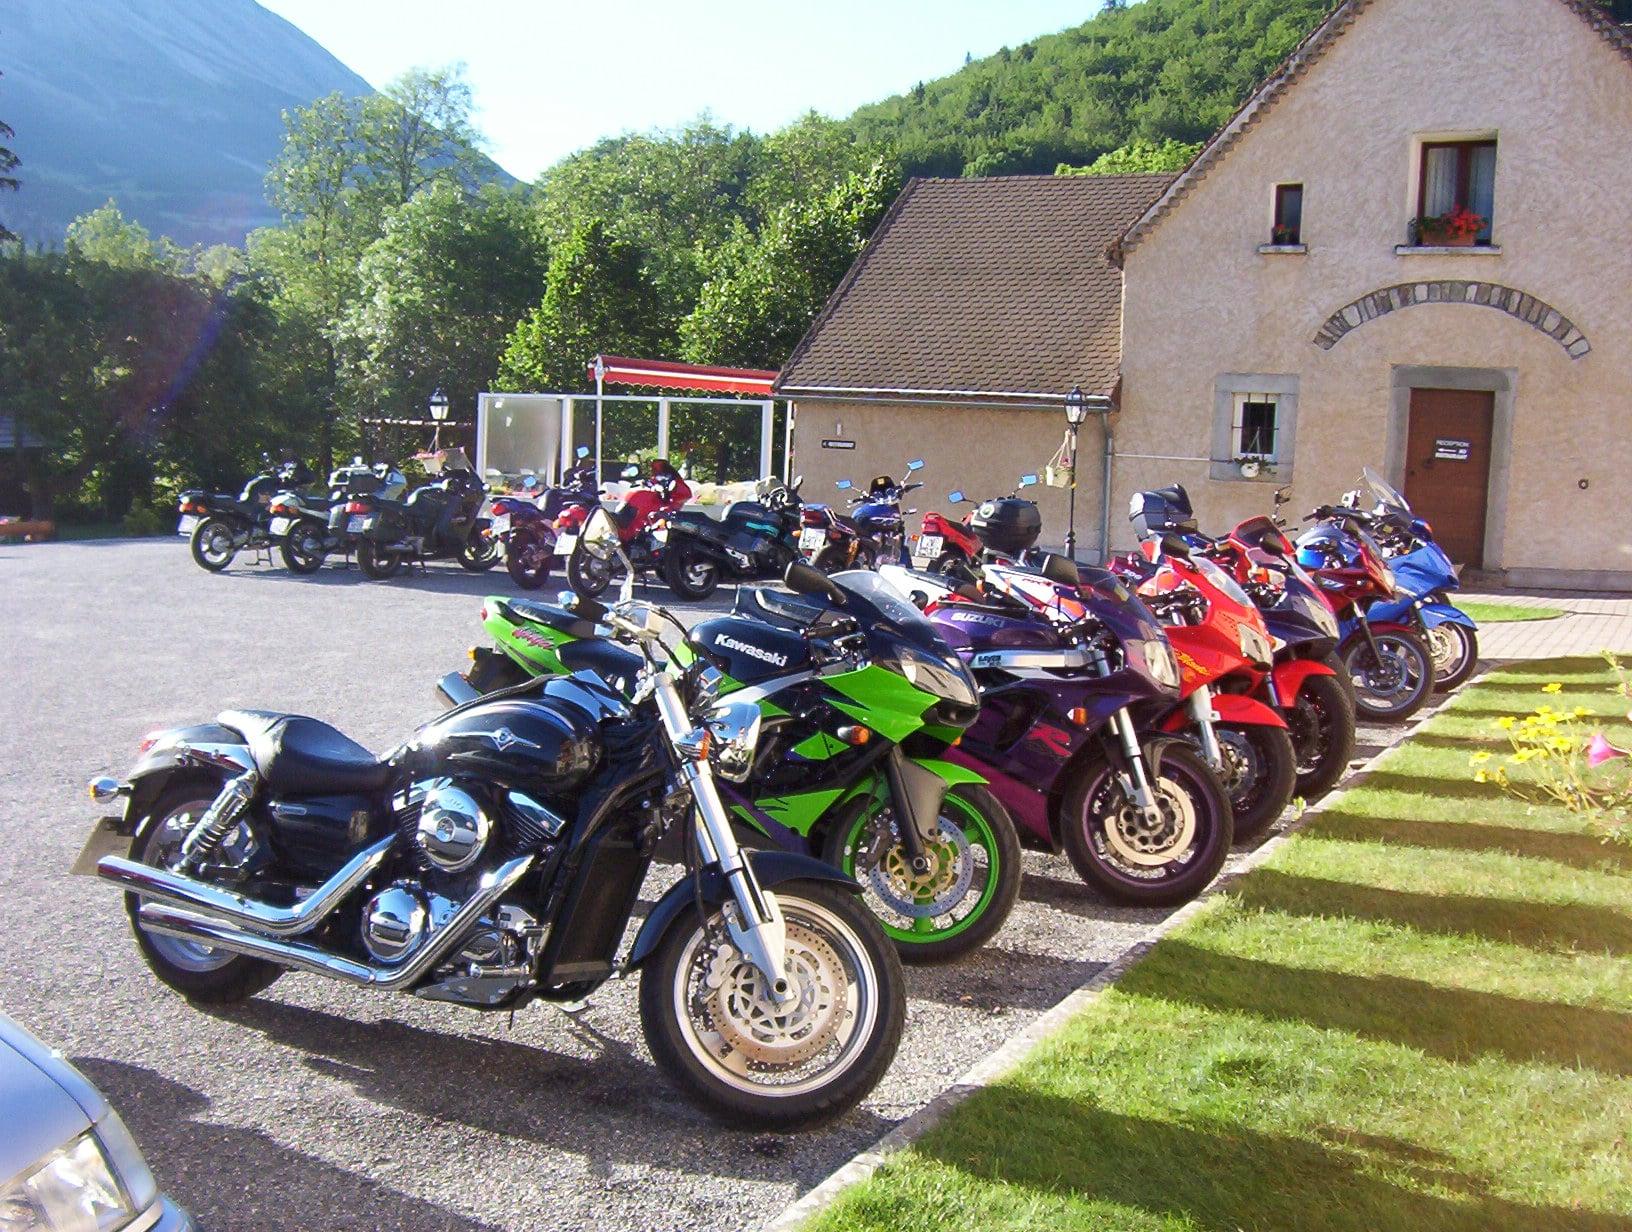 Rssemblement motards parking